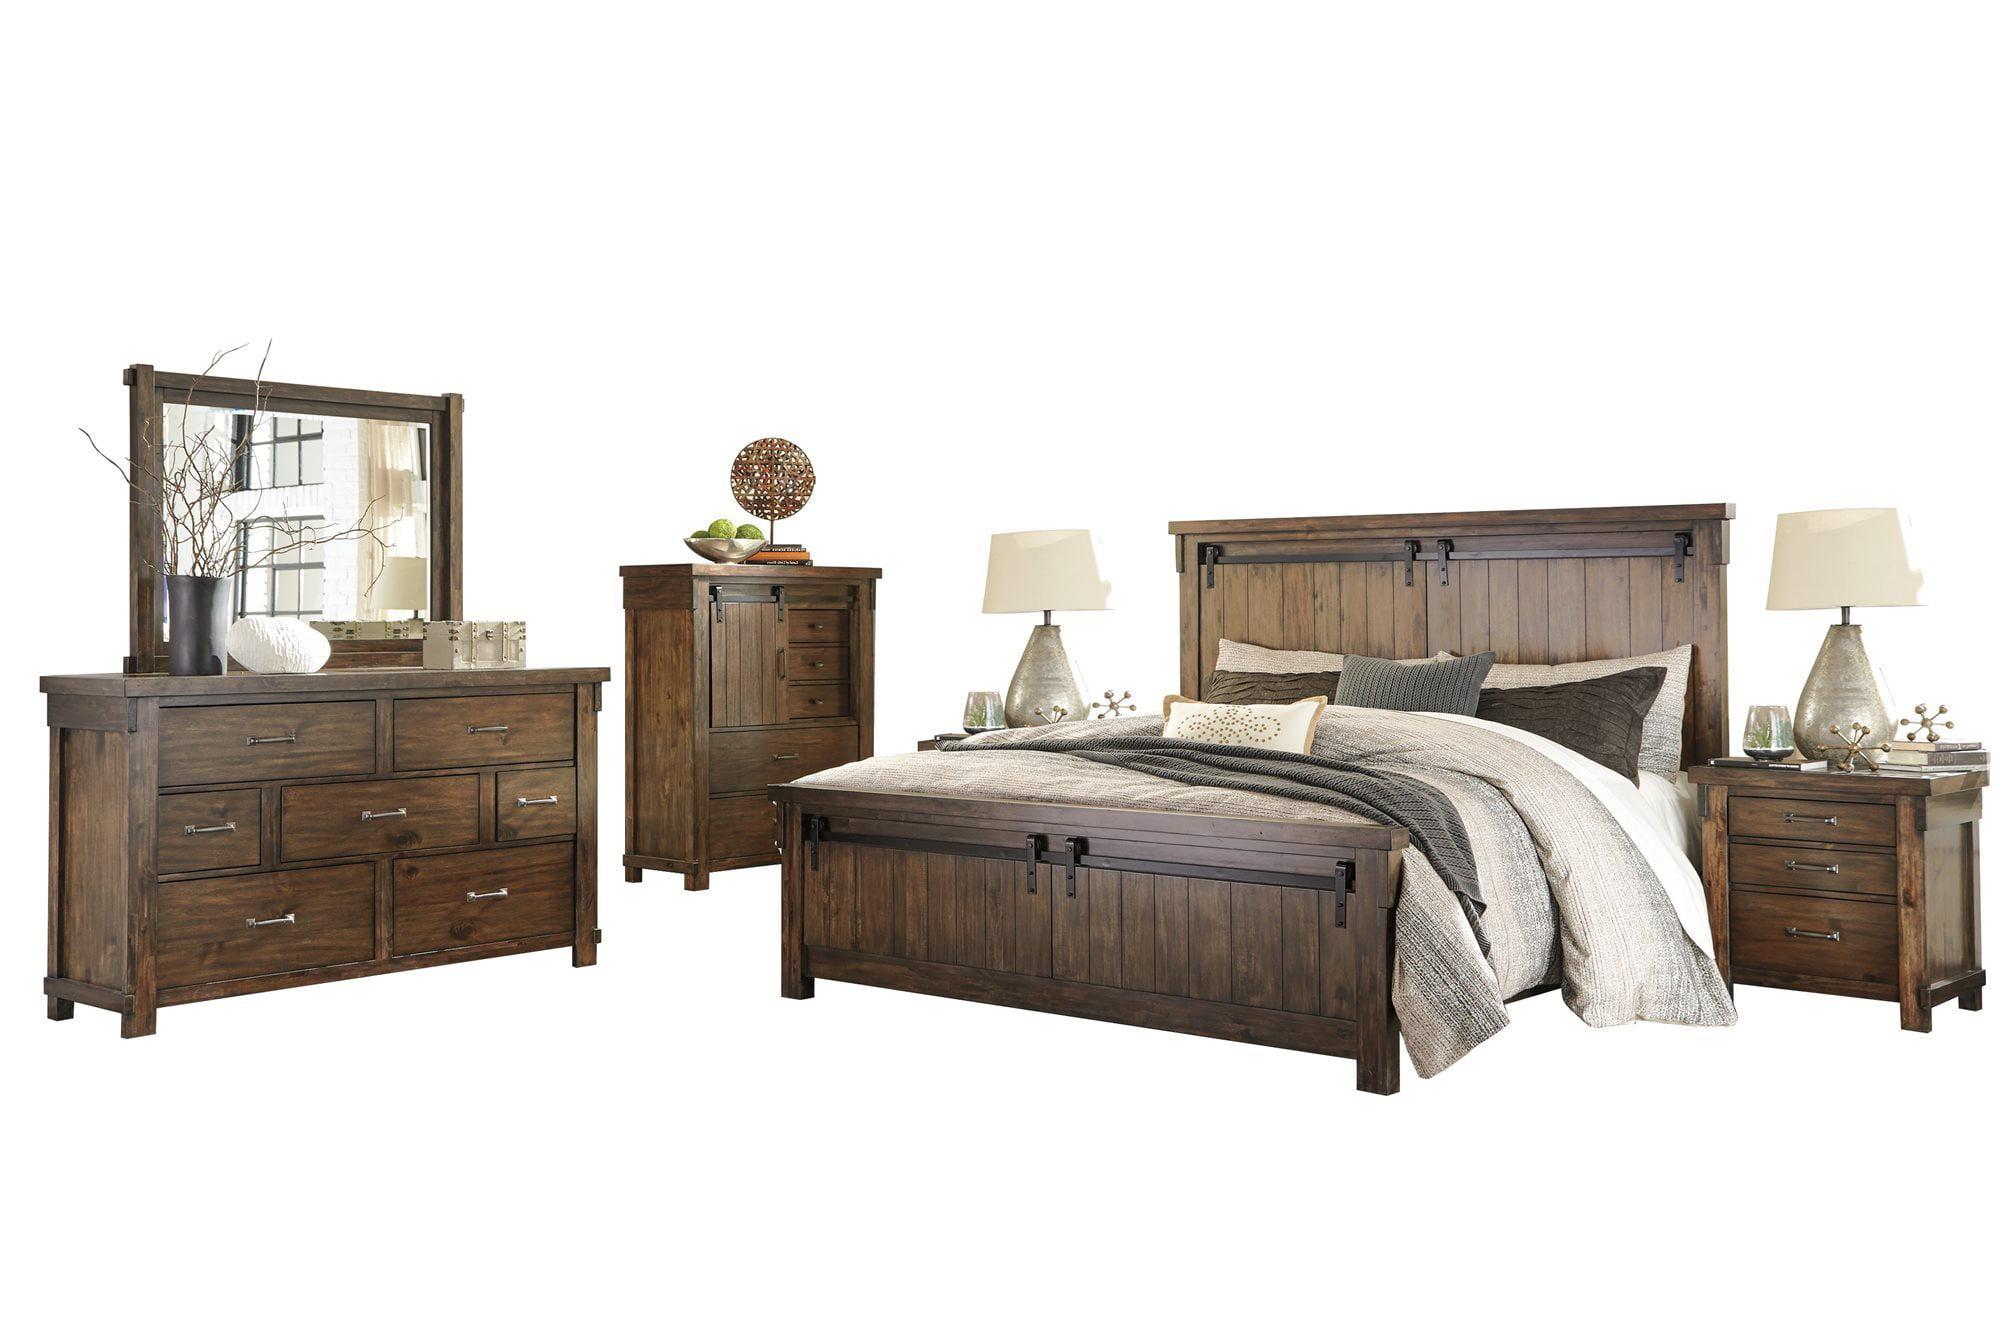 ashley furniture lakeleigh 6 pc bedroom set e king panel